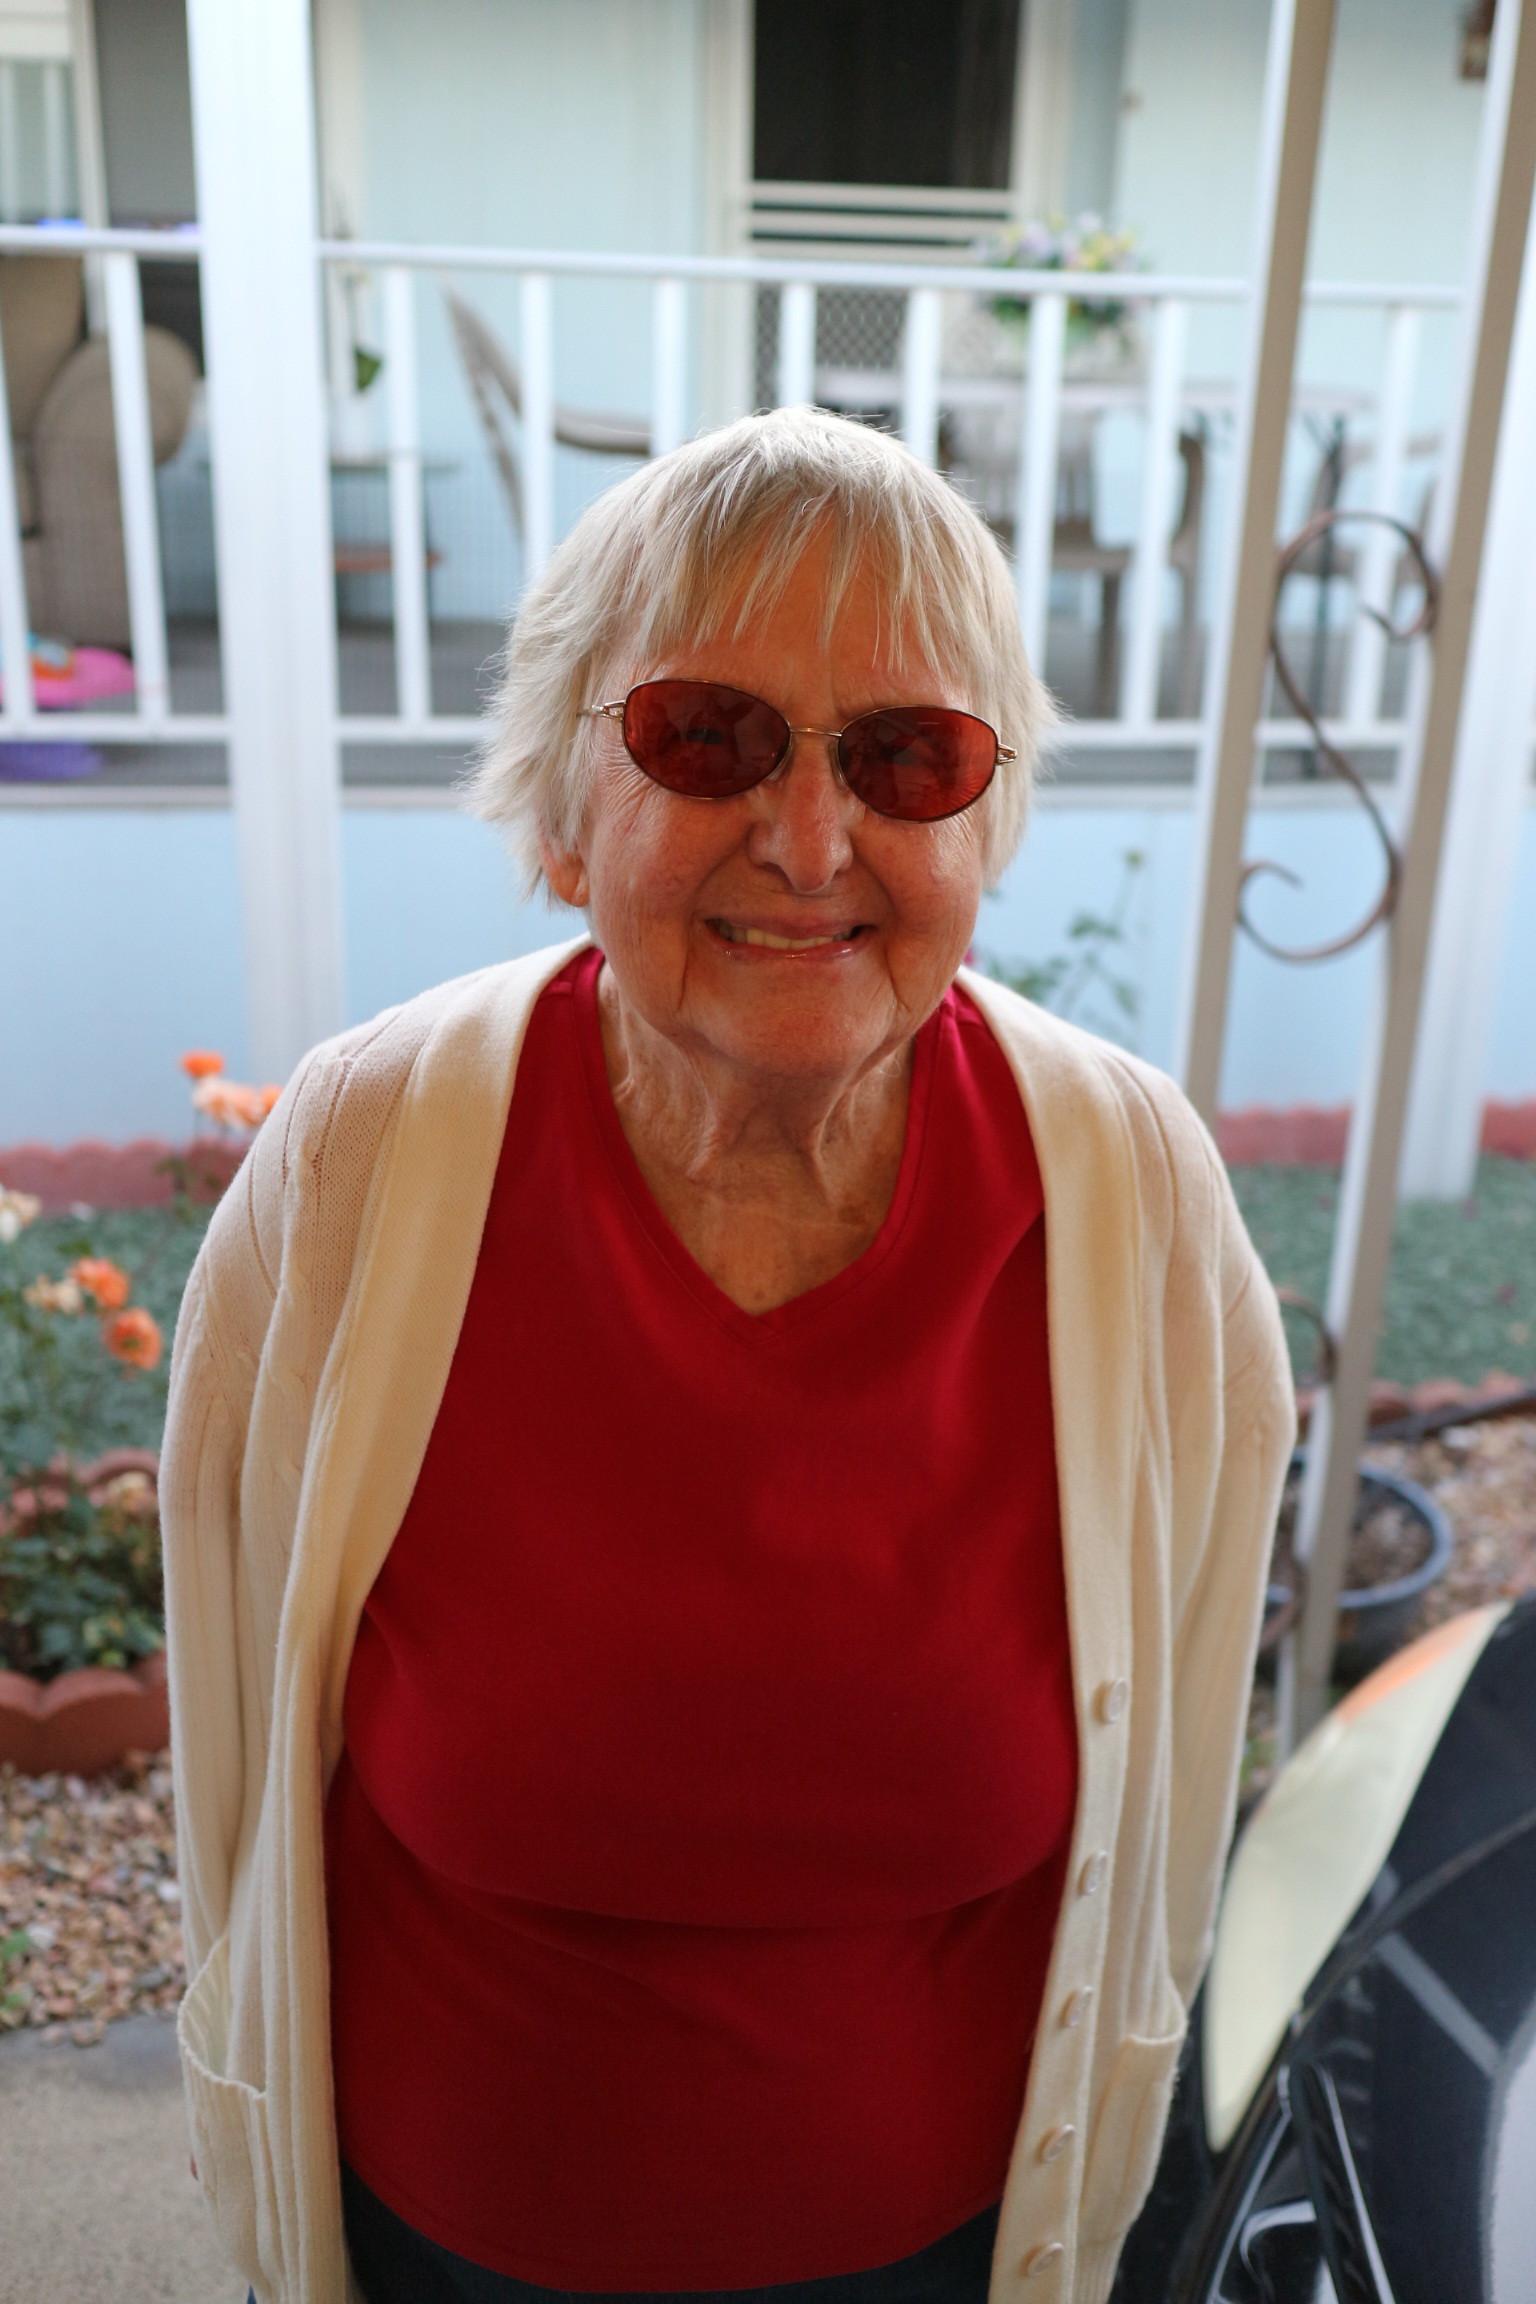 DGs wonderful grandmother!